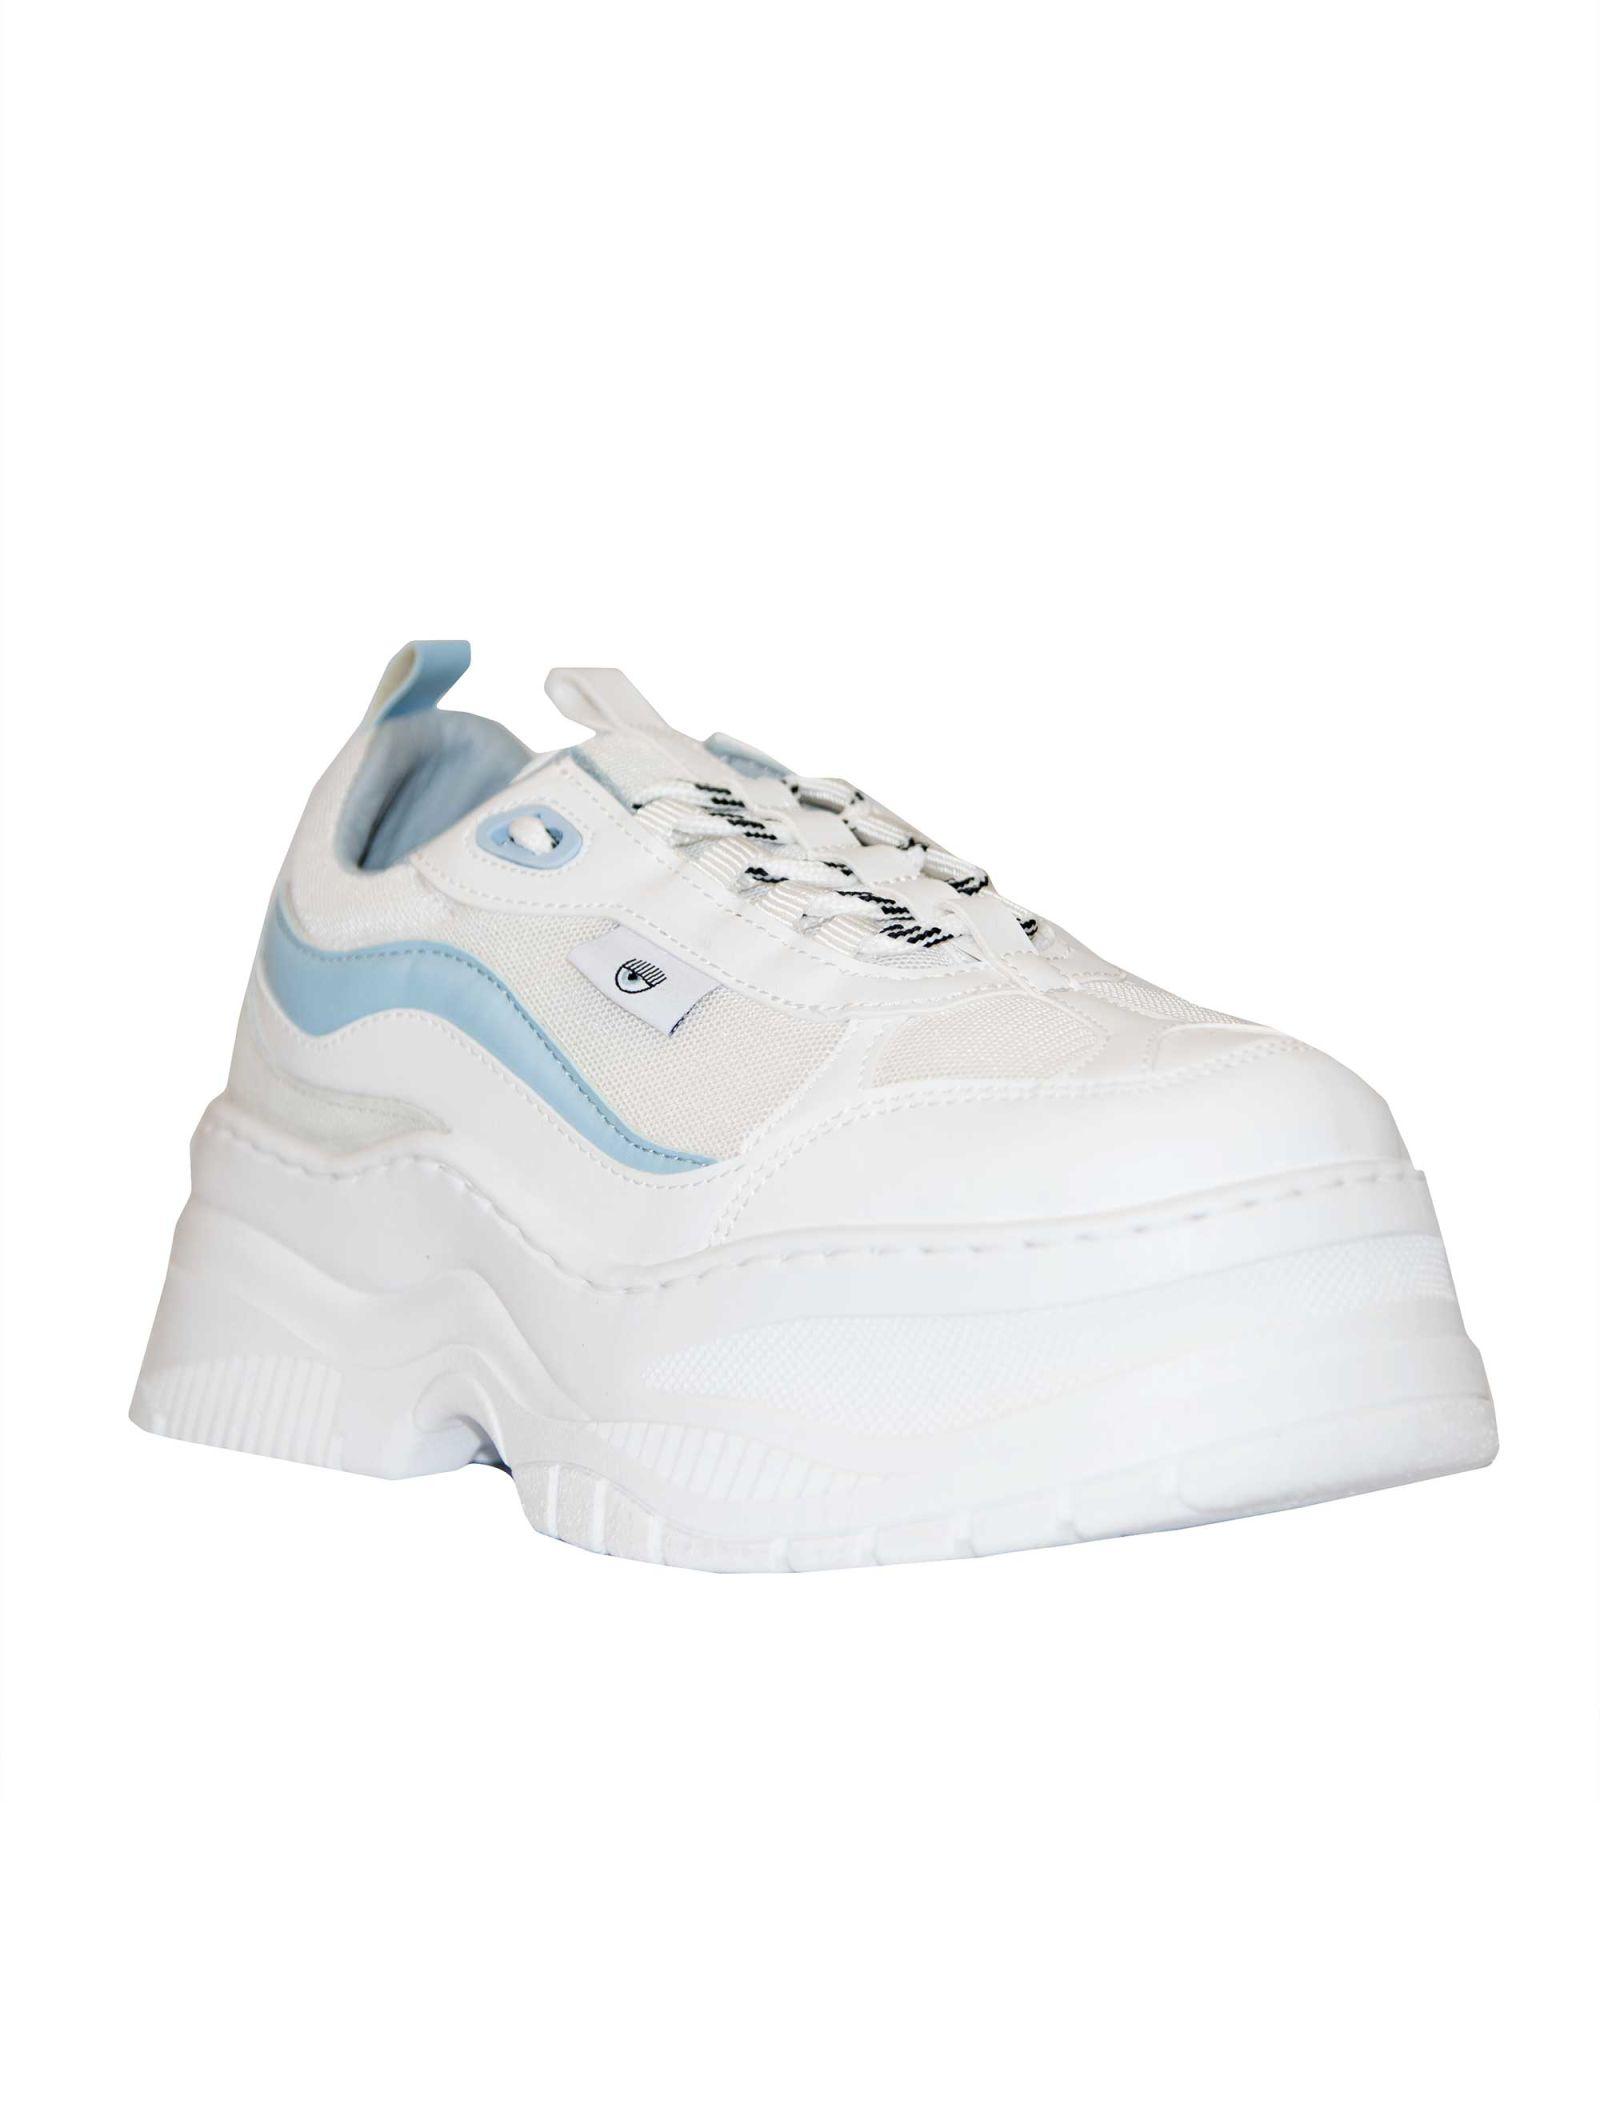 6cde91f137f Chiara Ferragni Chiara Ferragni Logo Platform Sneakers - Basic ...